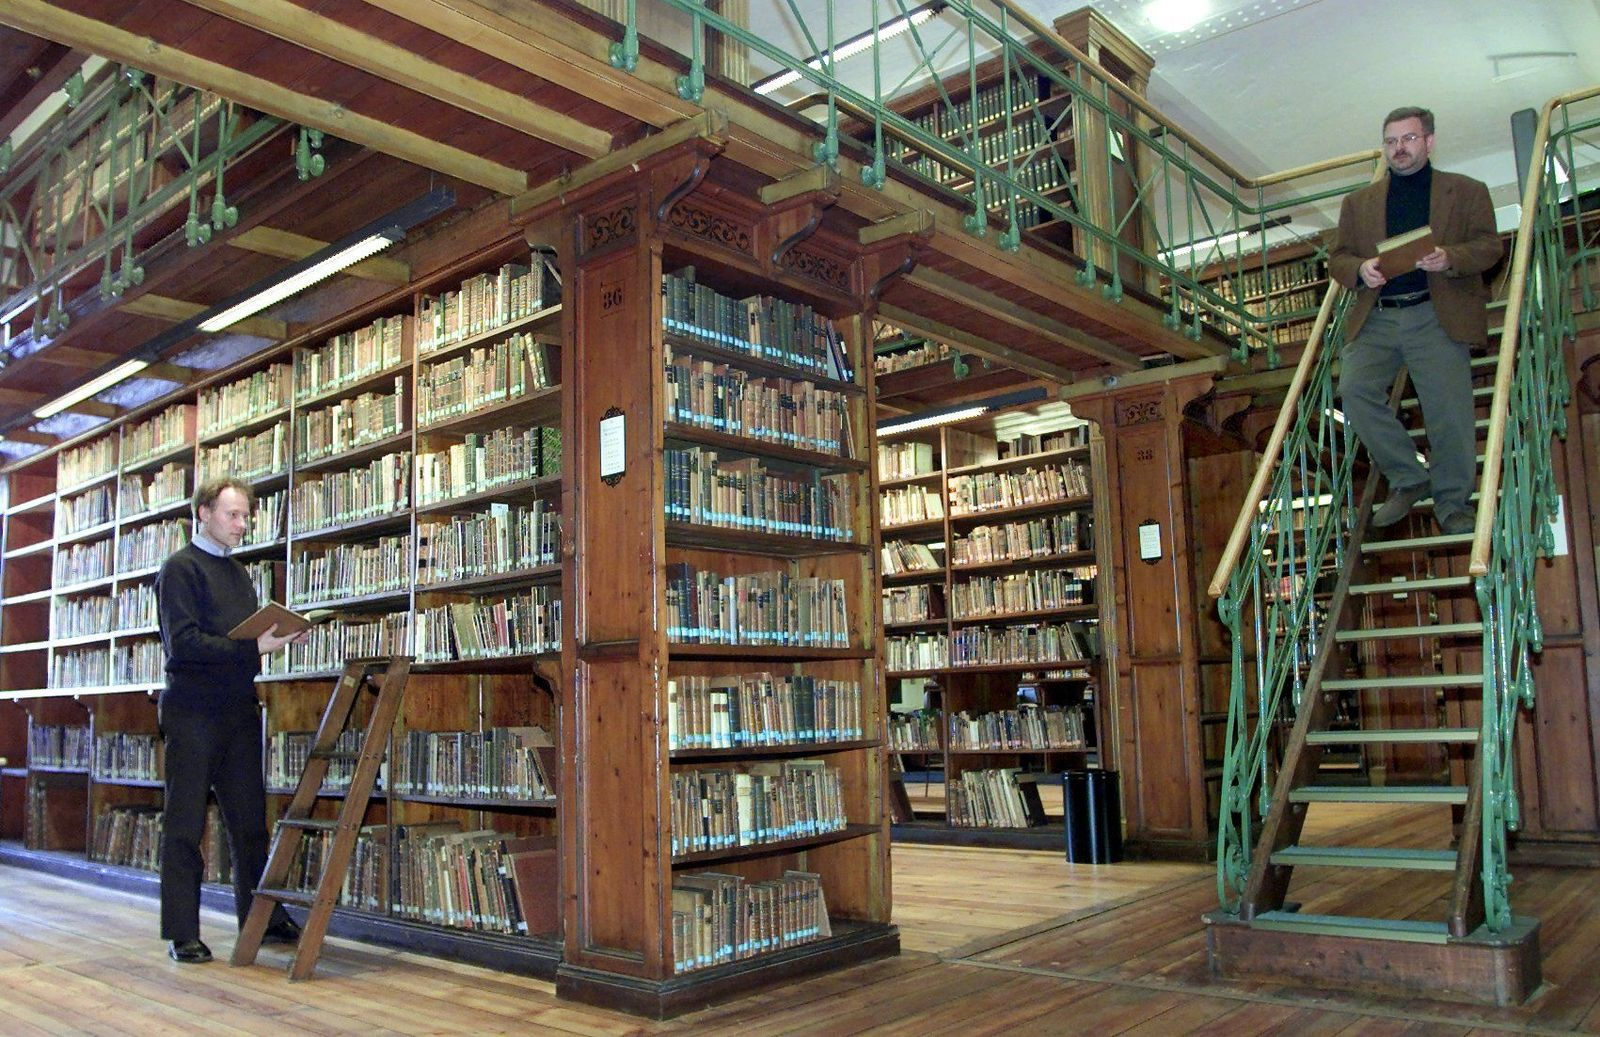 Universitätsbiliothek Göttingen